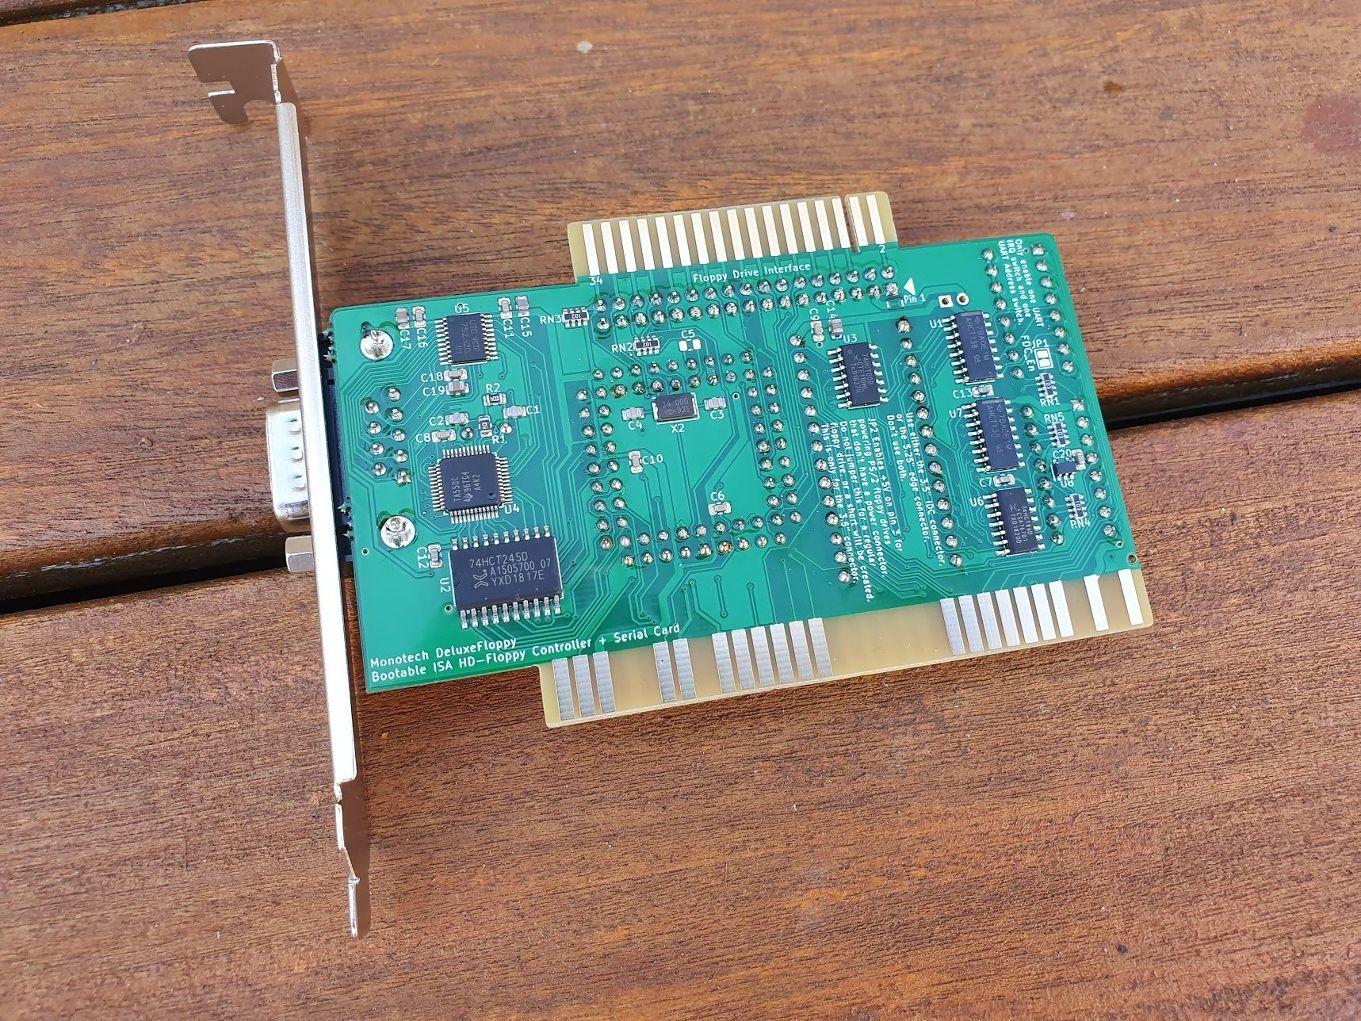 DeluxeFloppy - 8-bit ISA Bootable HD Floppy + Serial